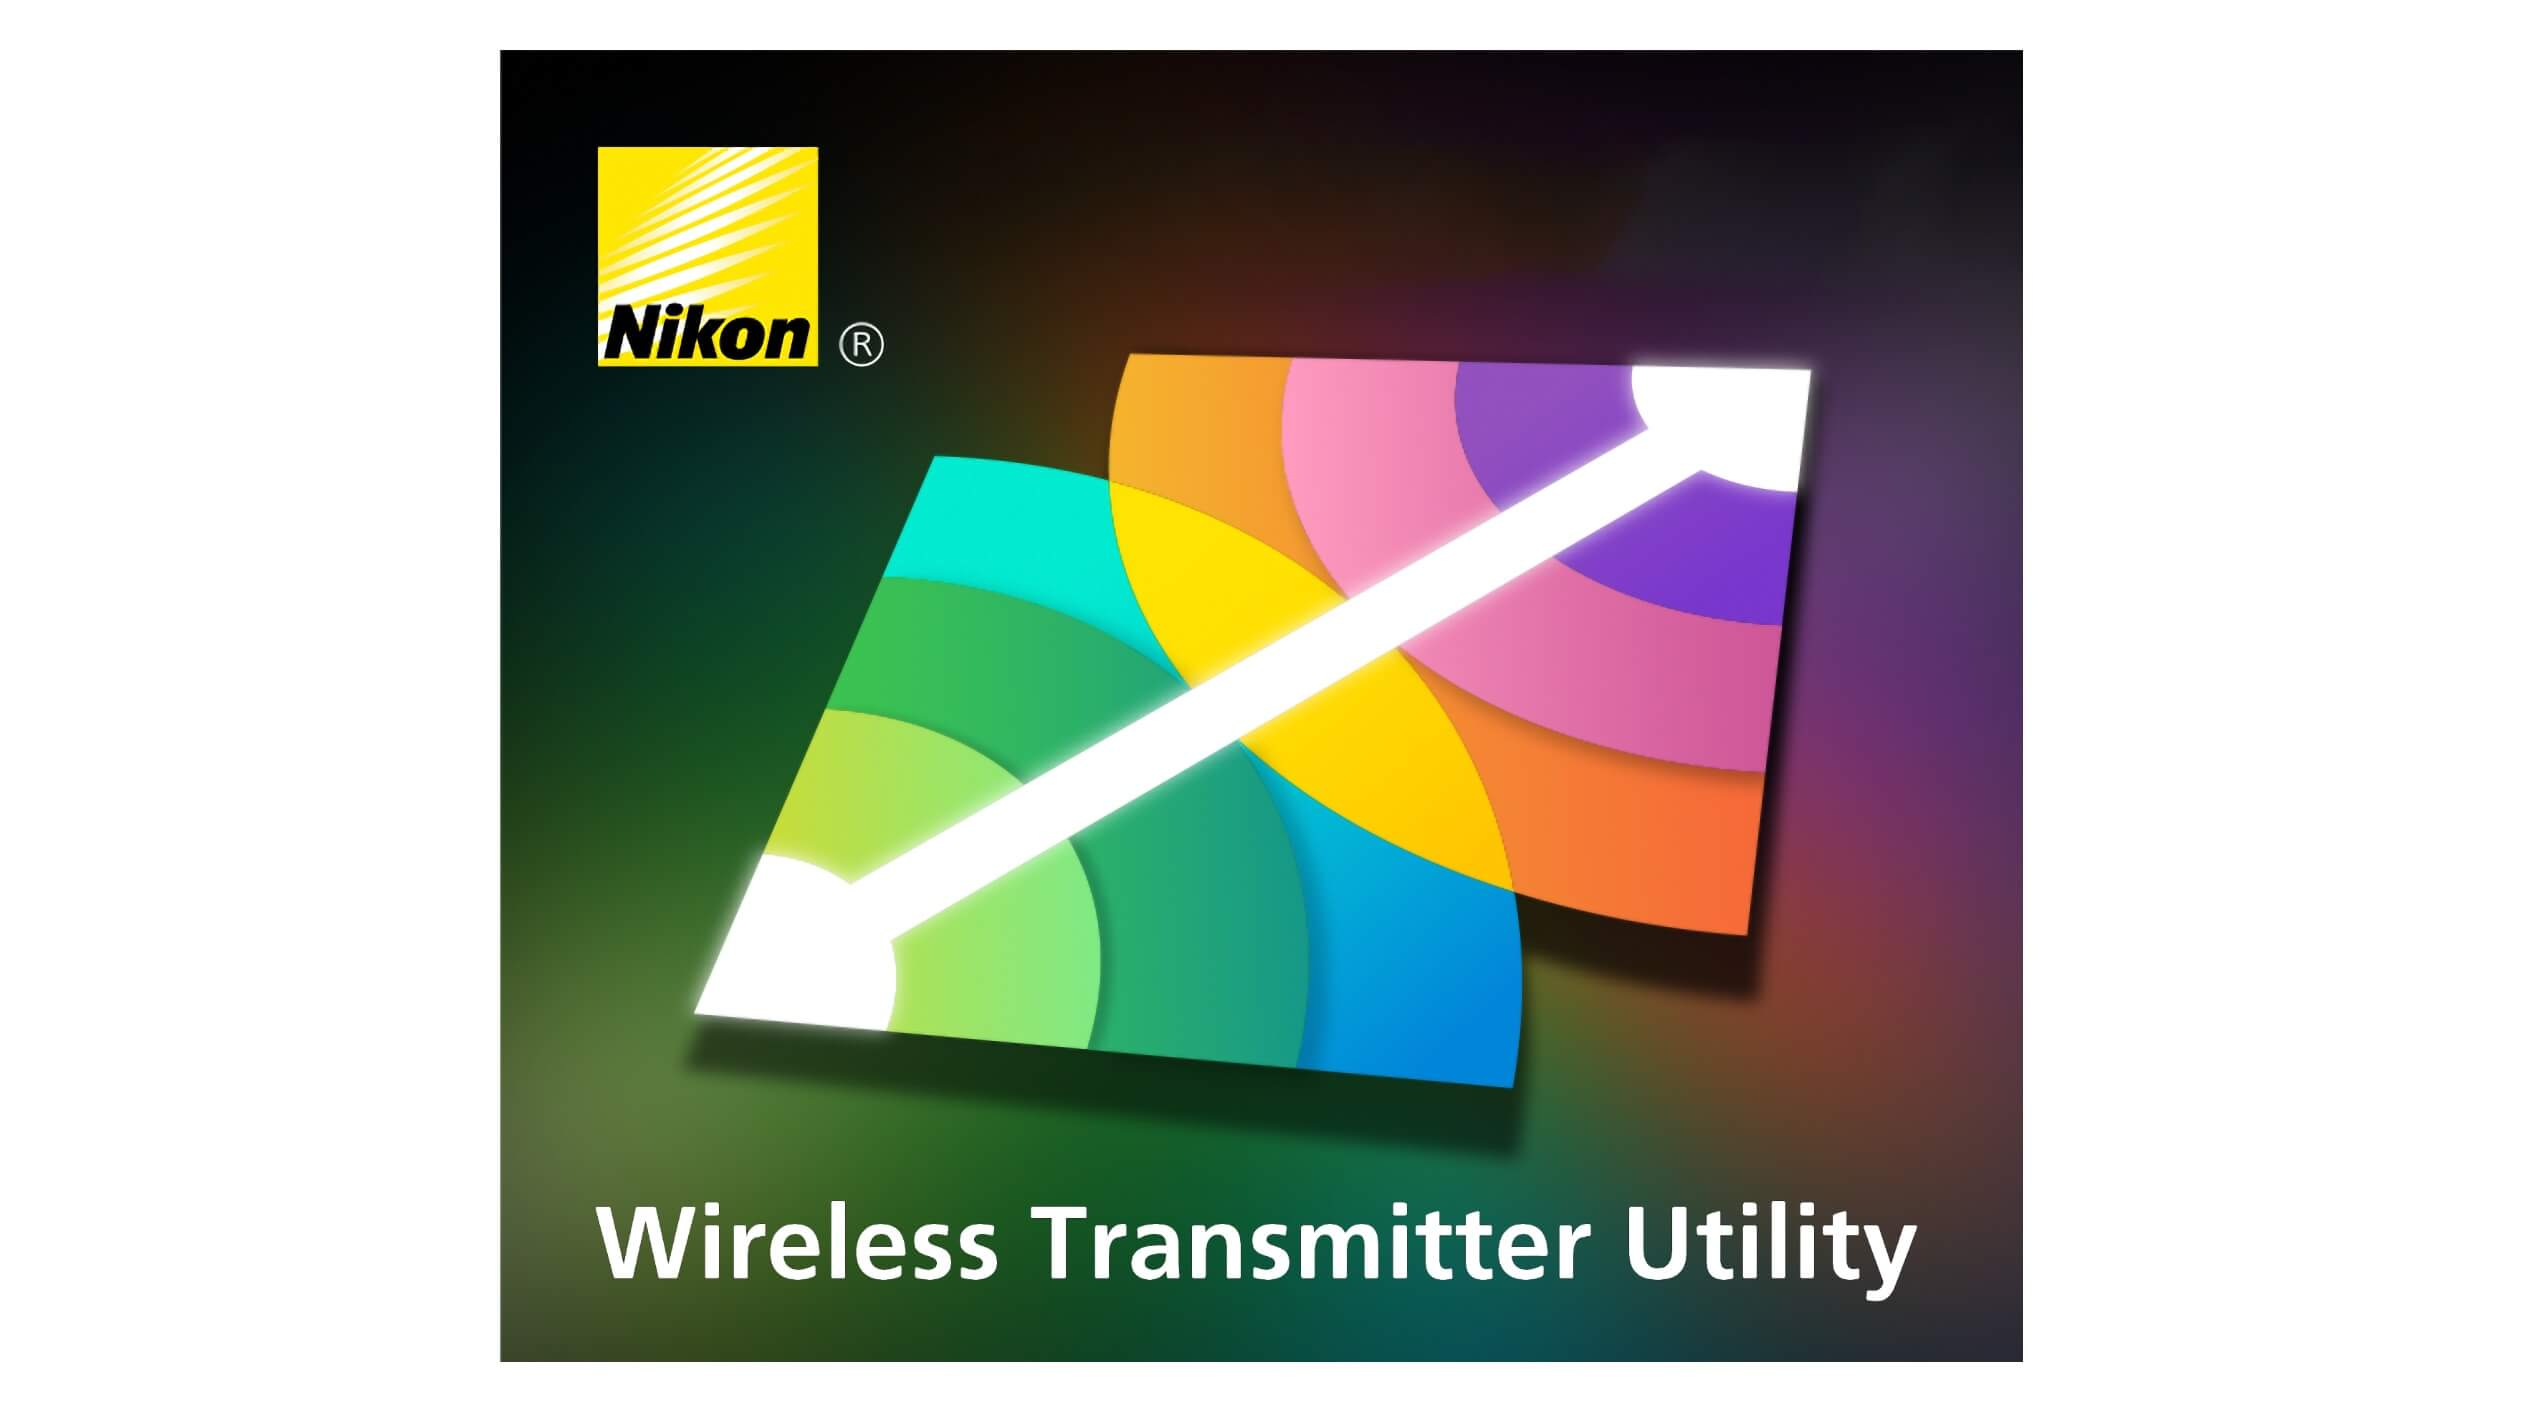 Nikon Wireless Transmitter Utility